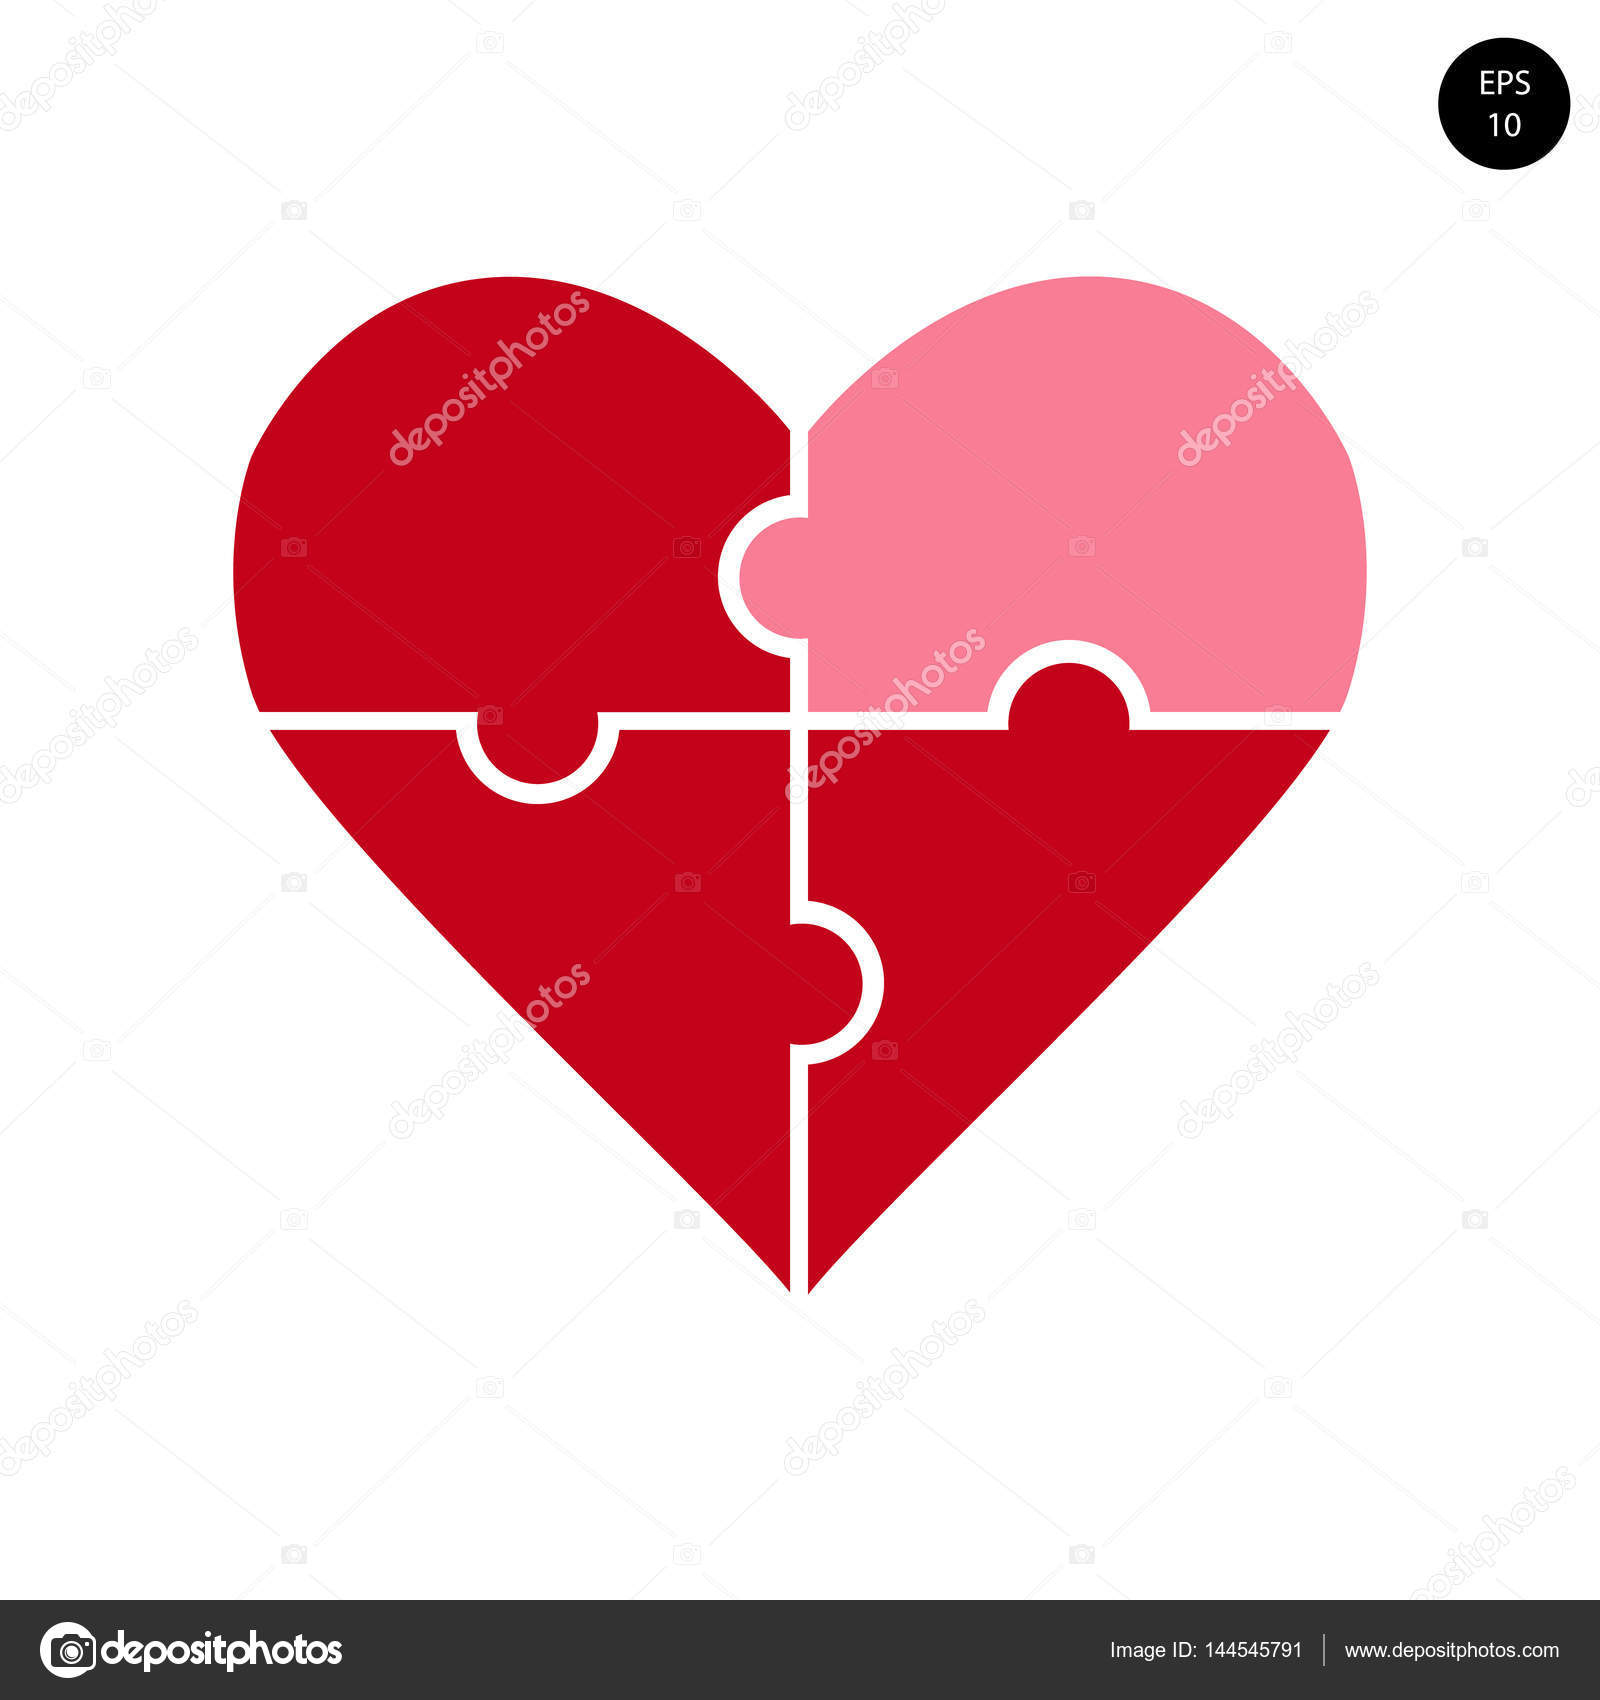 Vektor, Teile des Herzens, Puzzle, Valentinstag — Stockvektor © jene ...